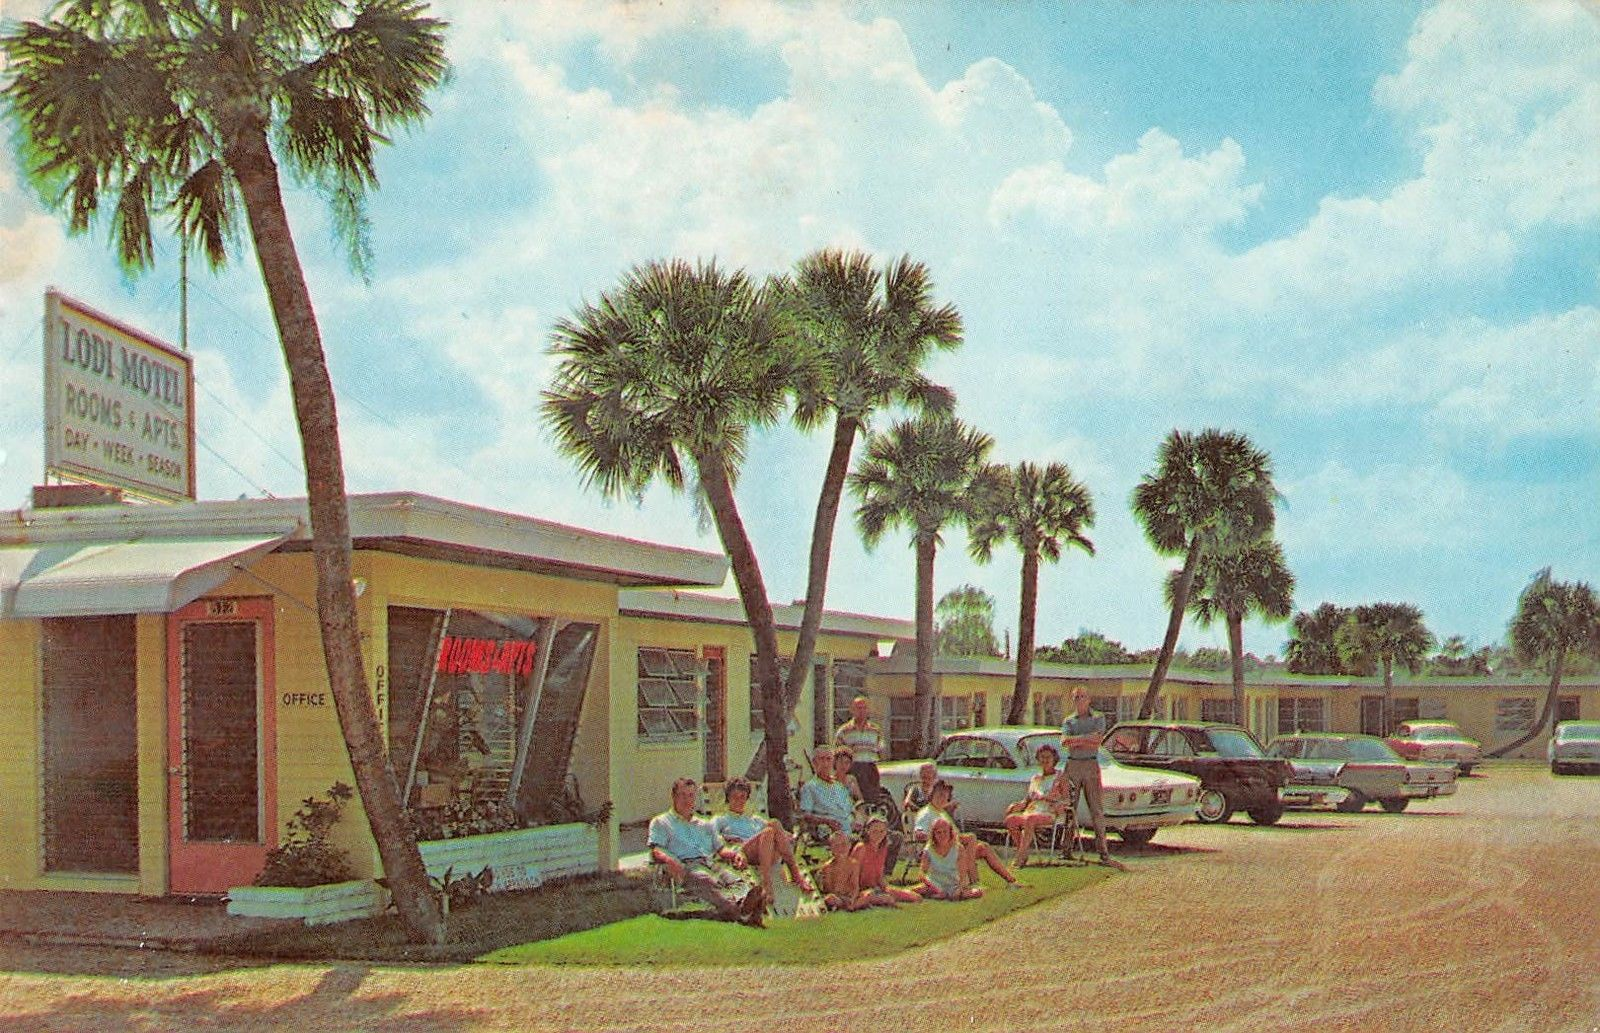 Fifties Land  Daytona Beach U0026 39 S Motels In The 1950s And 1960s